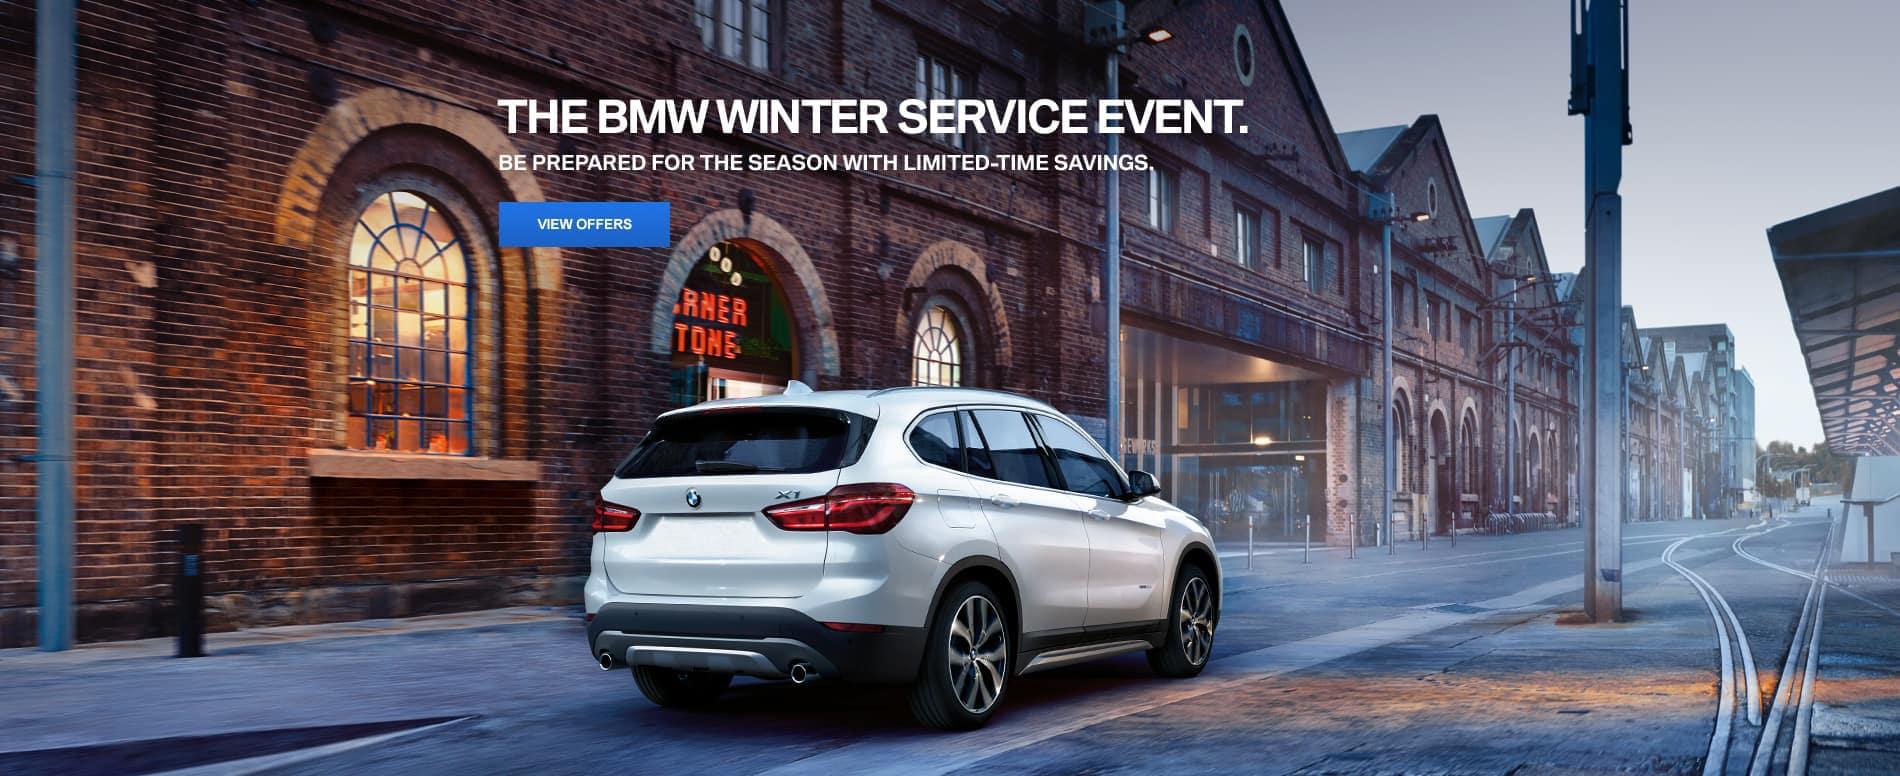 Elmhurst BMW a BMW Dealer Serving Chicago